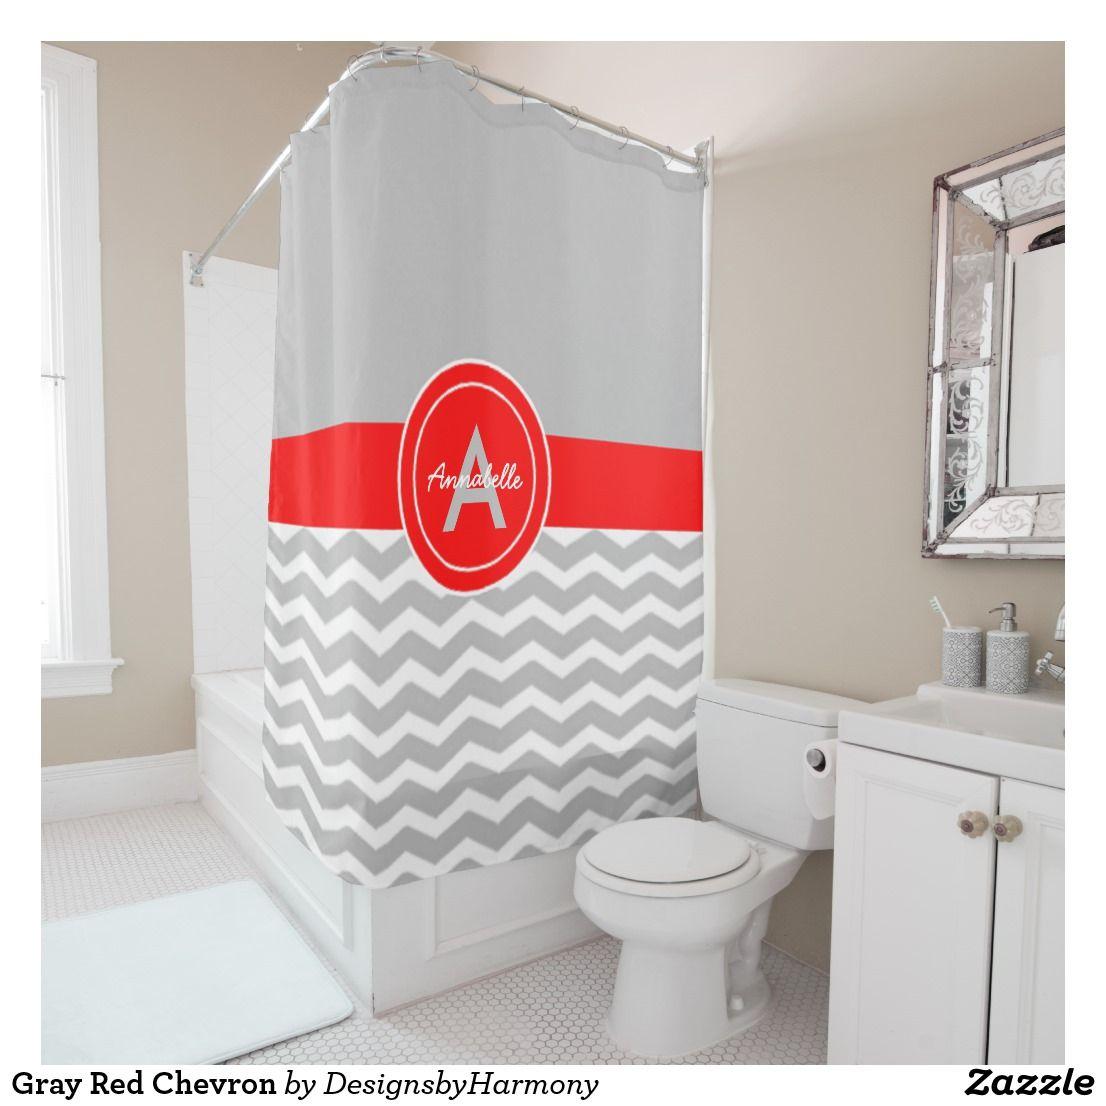 Red grey chevron shower curtain - Gray Red Chevron Shower Curtain